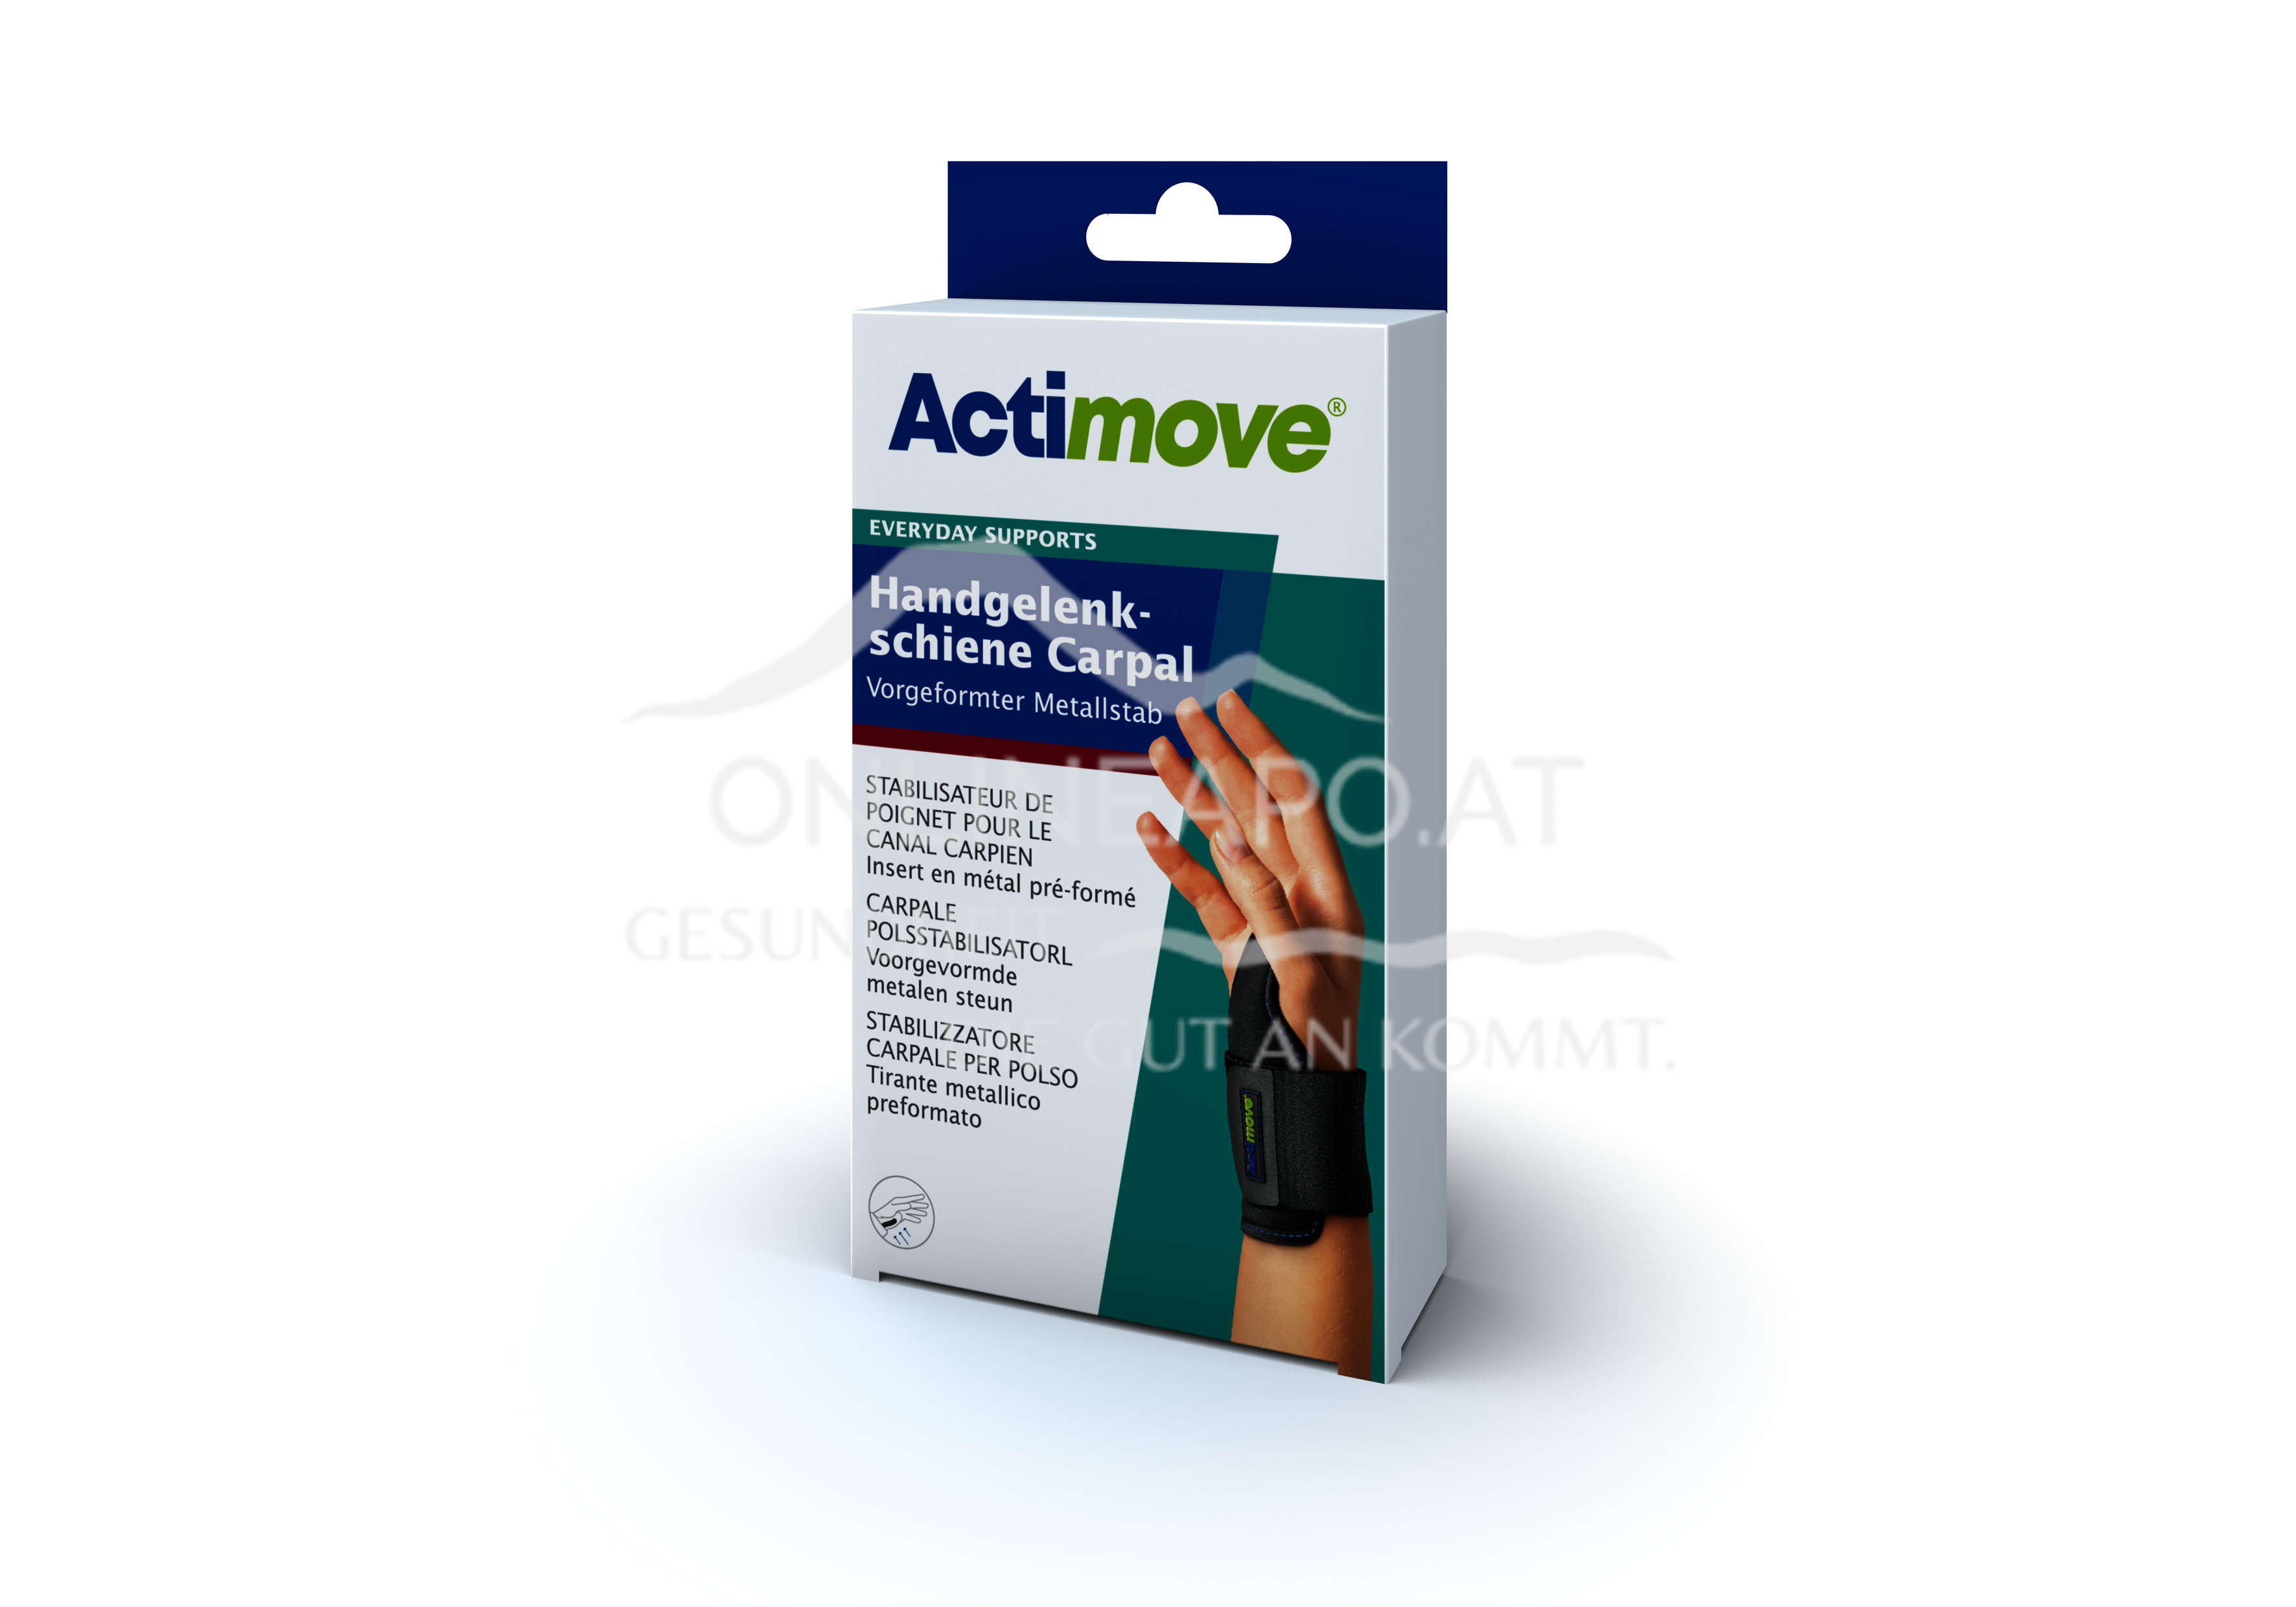 Actimove® Everyday Supports Handgelenkschine Carpal